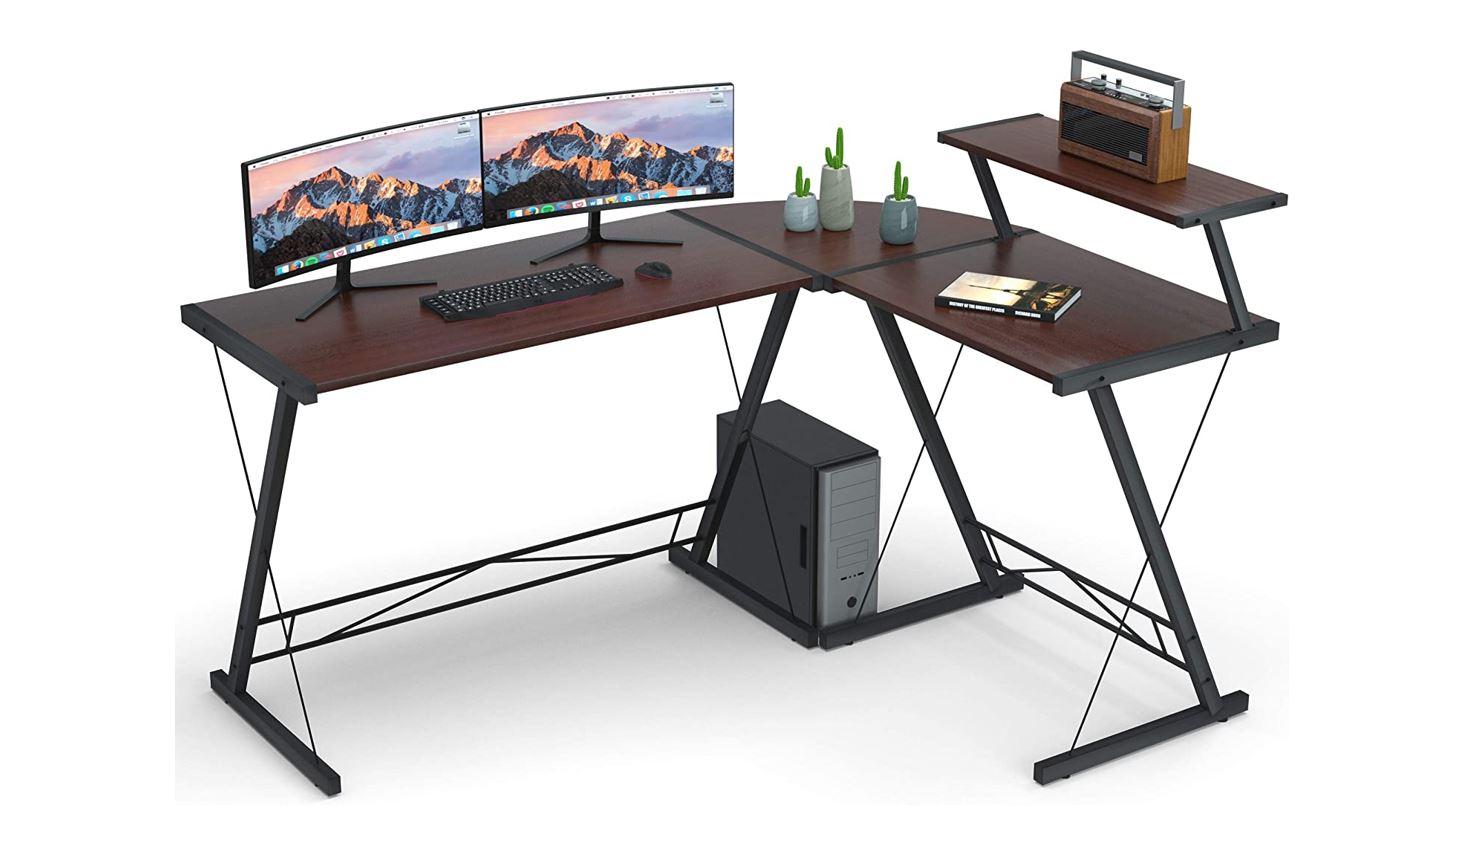 Coleshome Reversible L Shaped Desk Promo Image